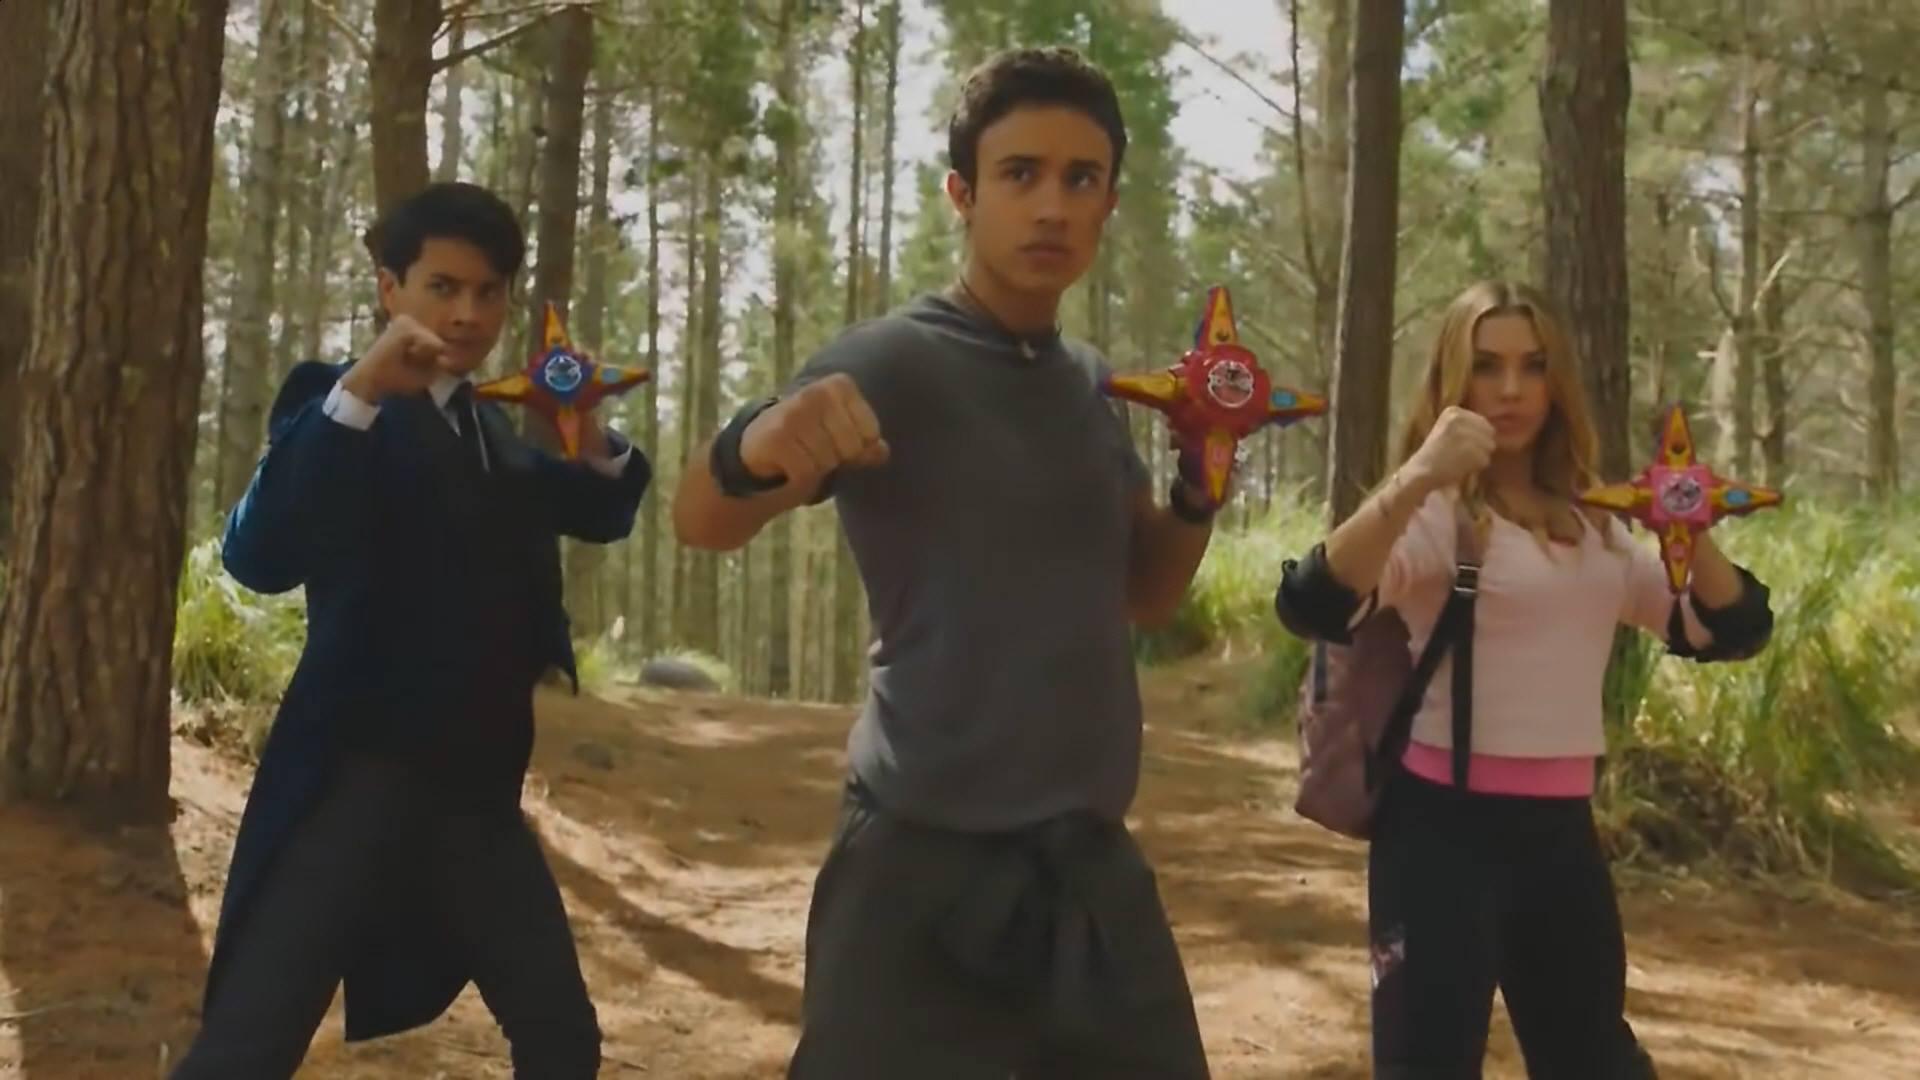 Power Rangers Ninja Steel Premiere Date and First Two Episode Summaries